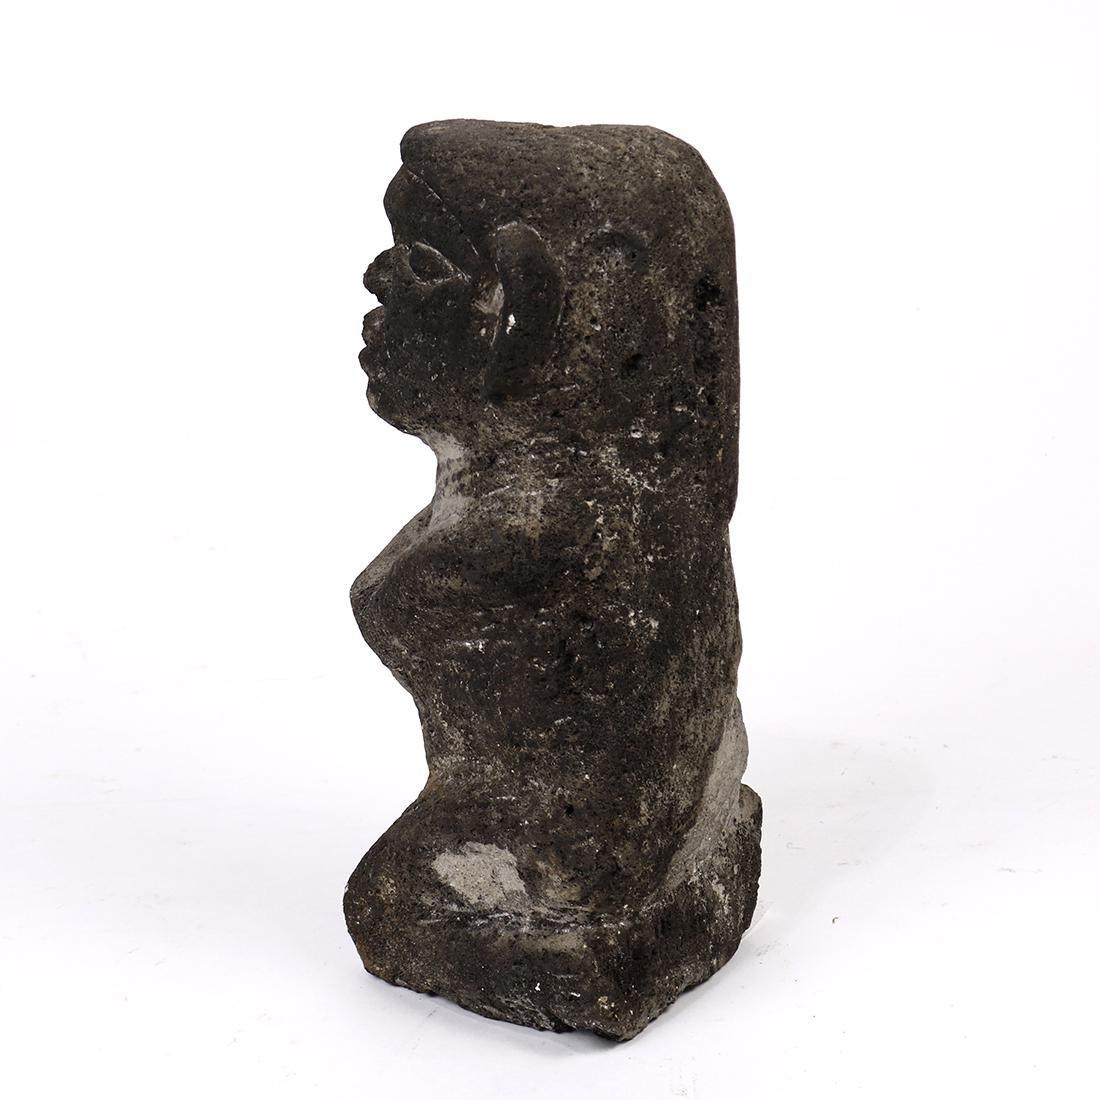 Primitive style stone figure - 2